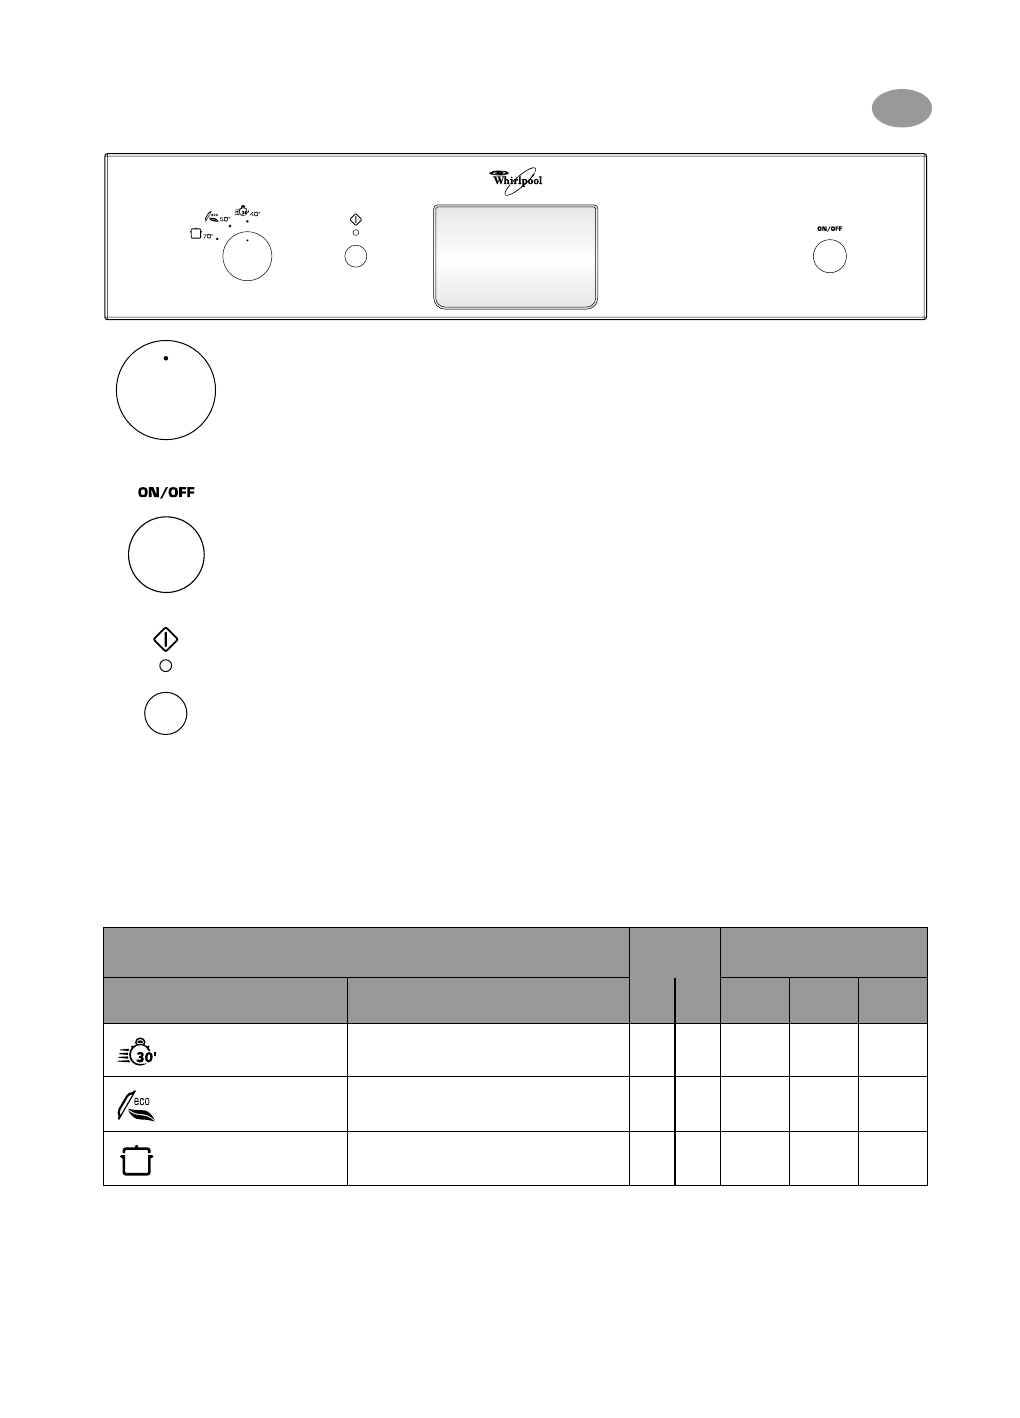 handleiding whirlpool adg 8315 nb wh pagina 1 van 4 deutsch. Black Bedroom Furniture Sets. Home Design Ideas